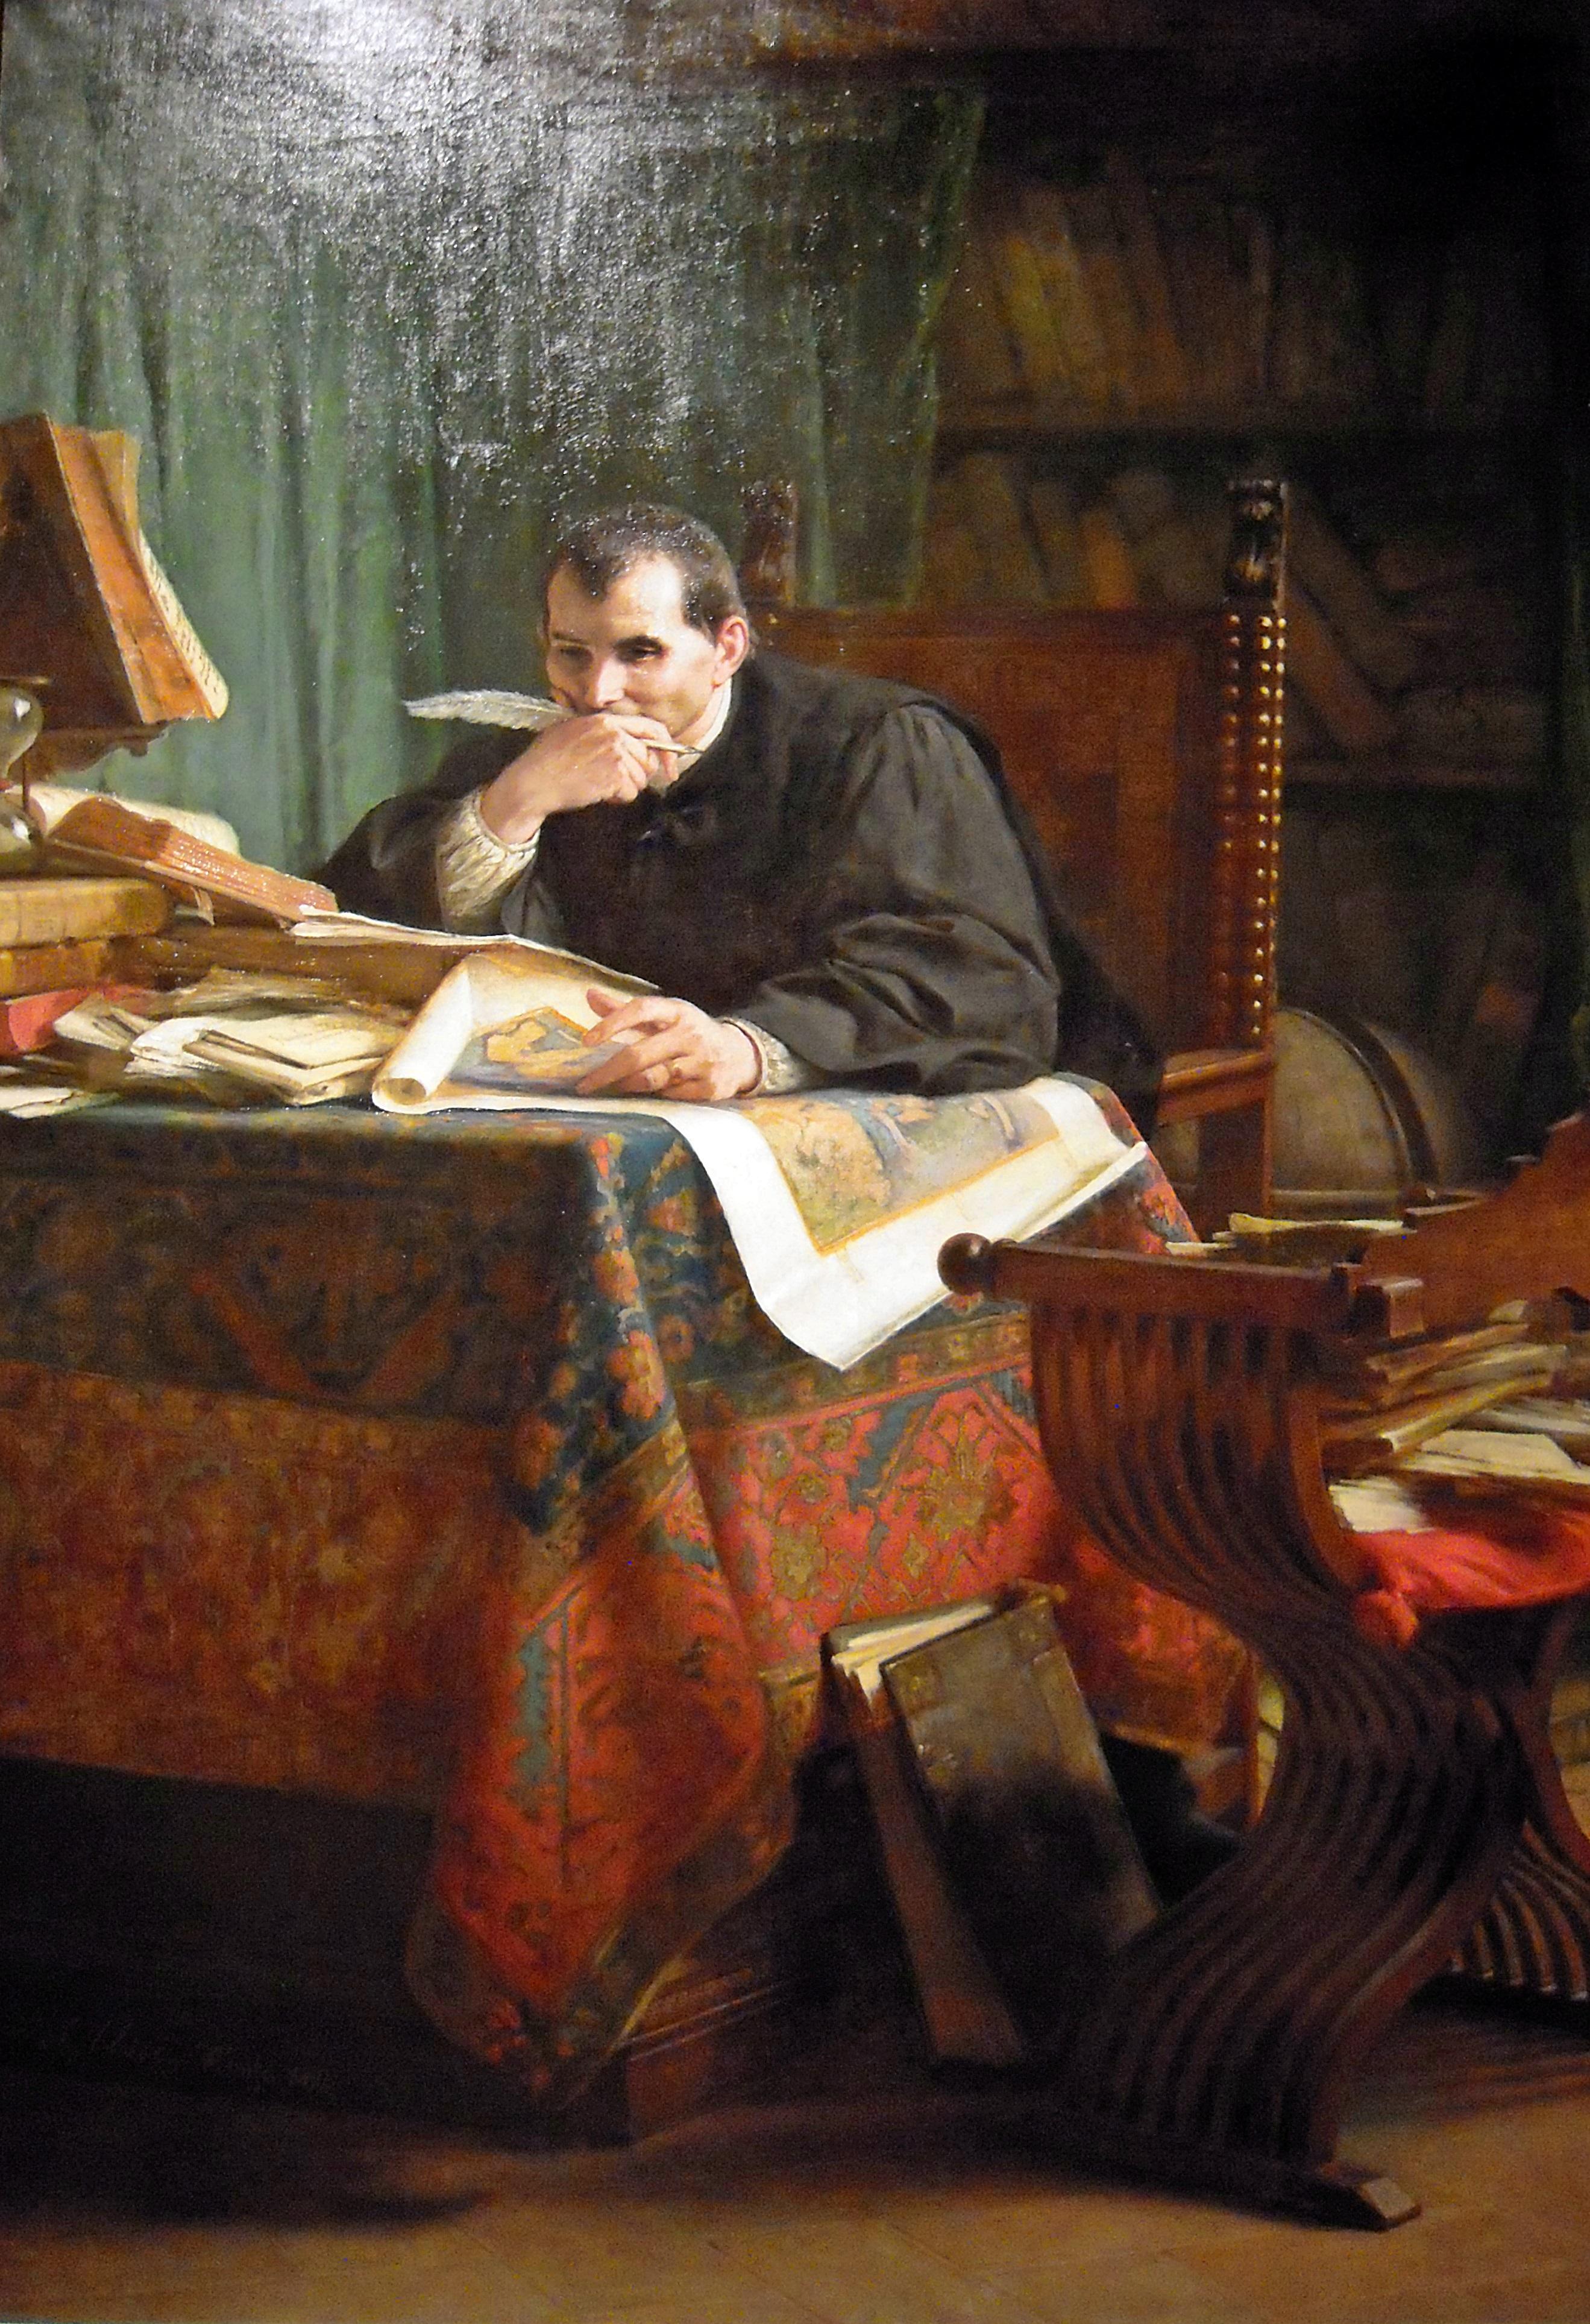 11. Niccolò Machiavelli in his study- από τον Stefano Ussisi1894-Galleria Nazionale d'Arte Moderna